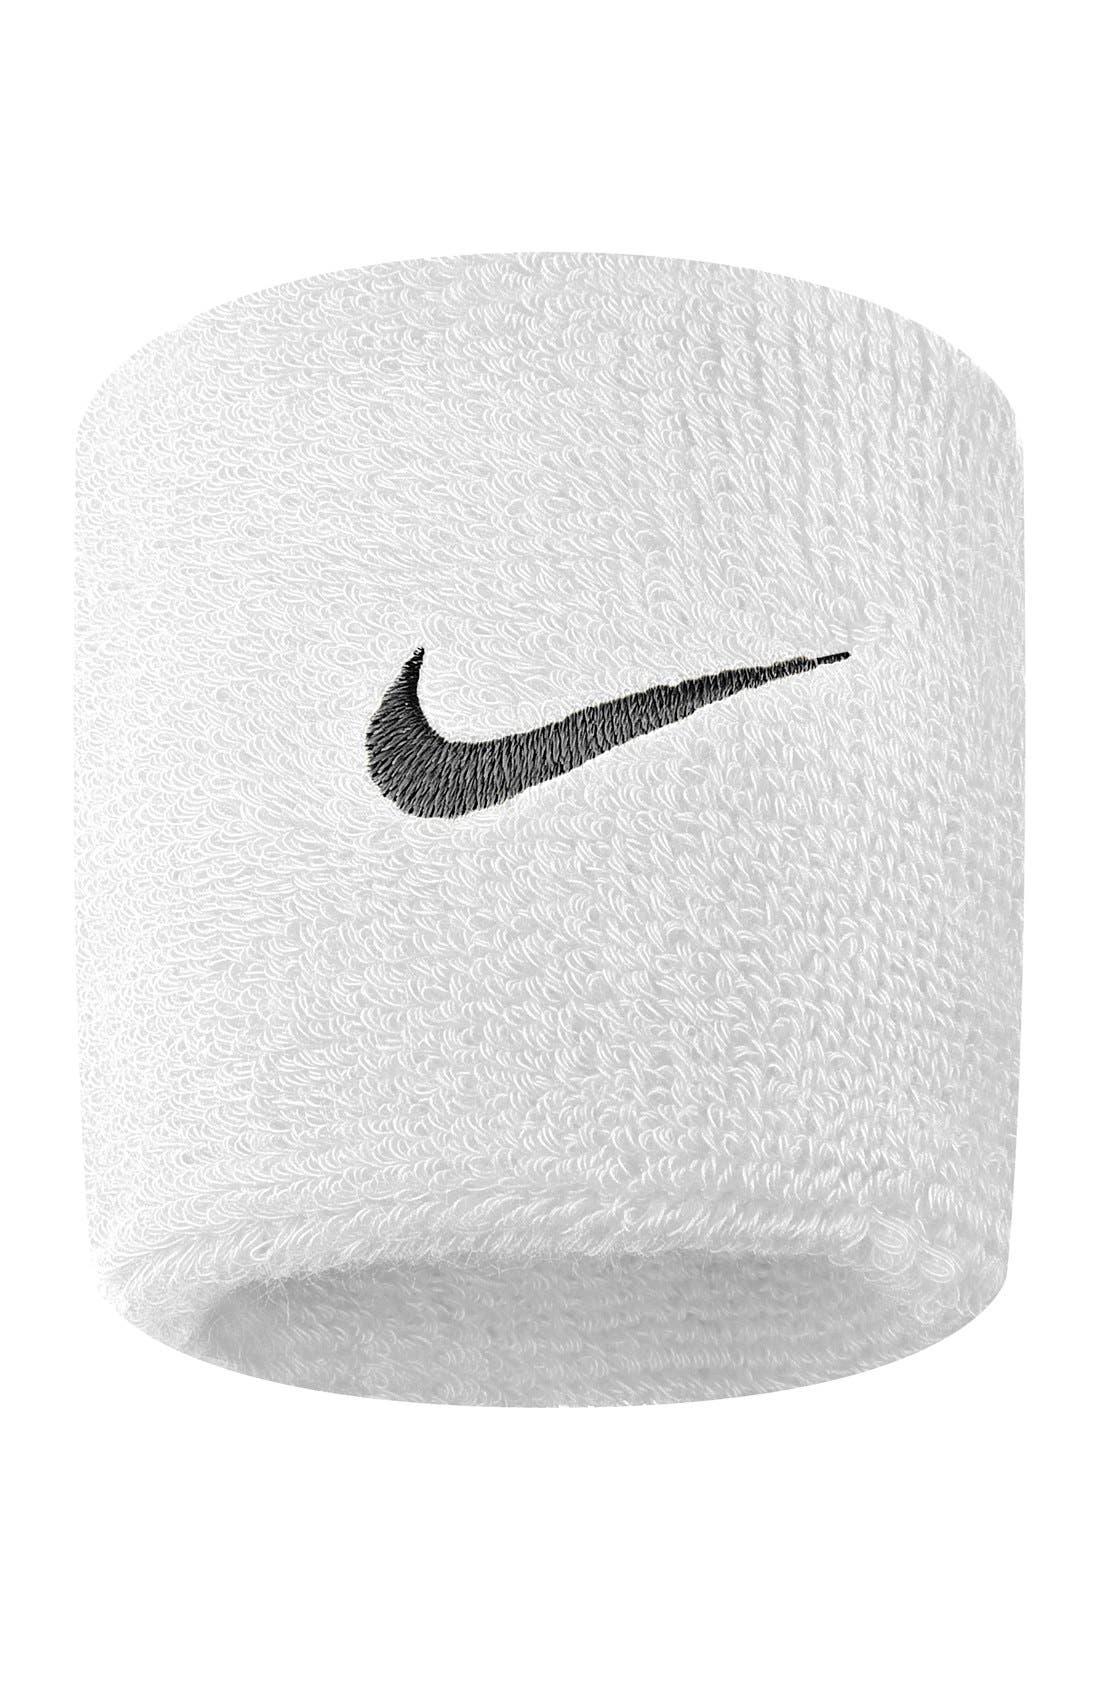 Main Image - Nike 'Swoosh' Wristbands